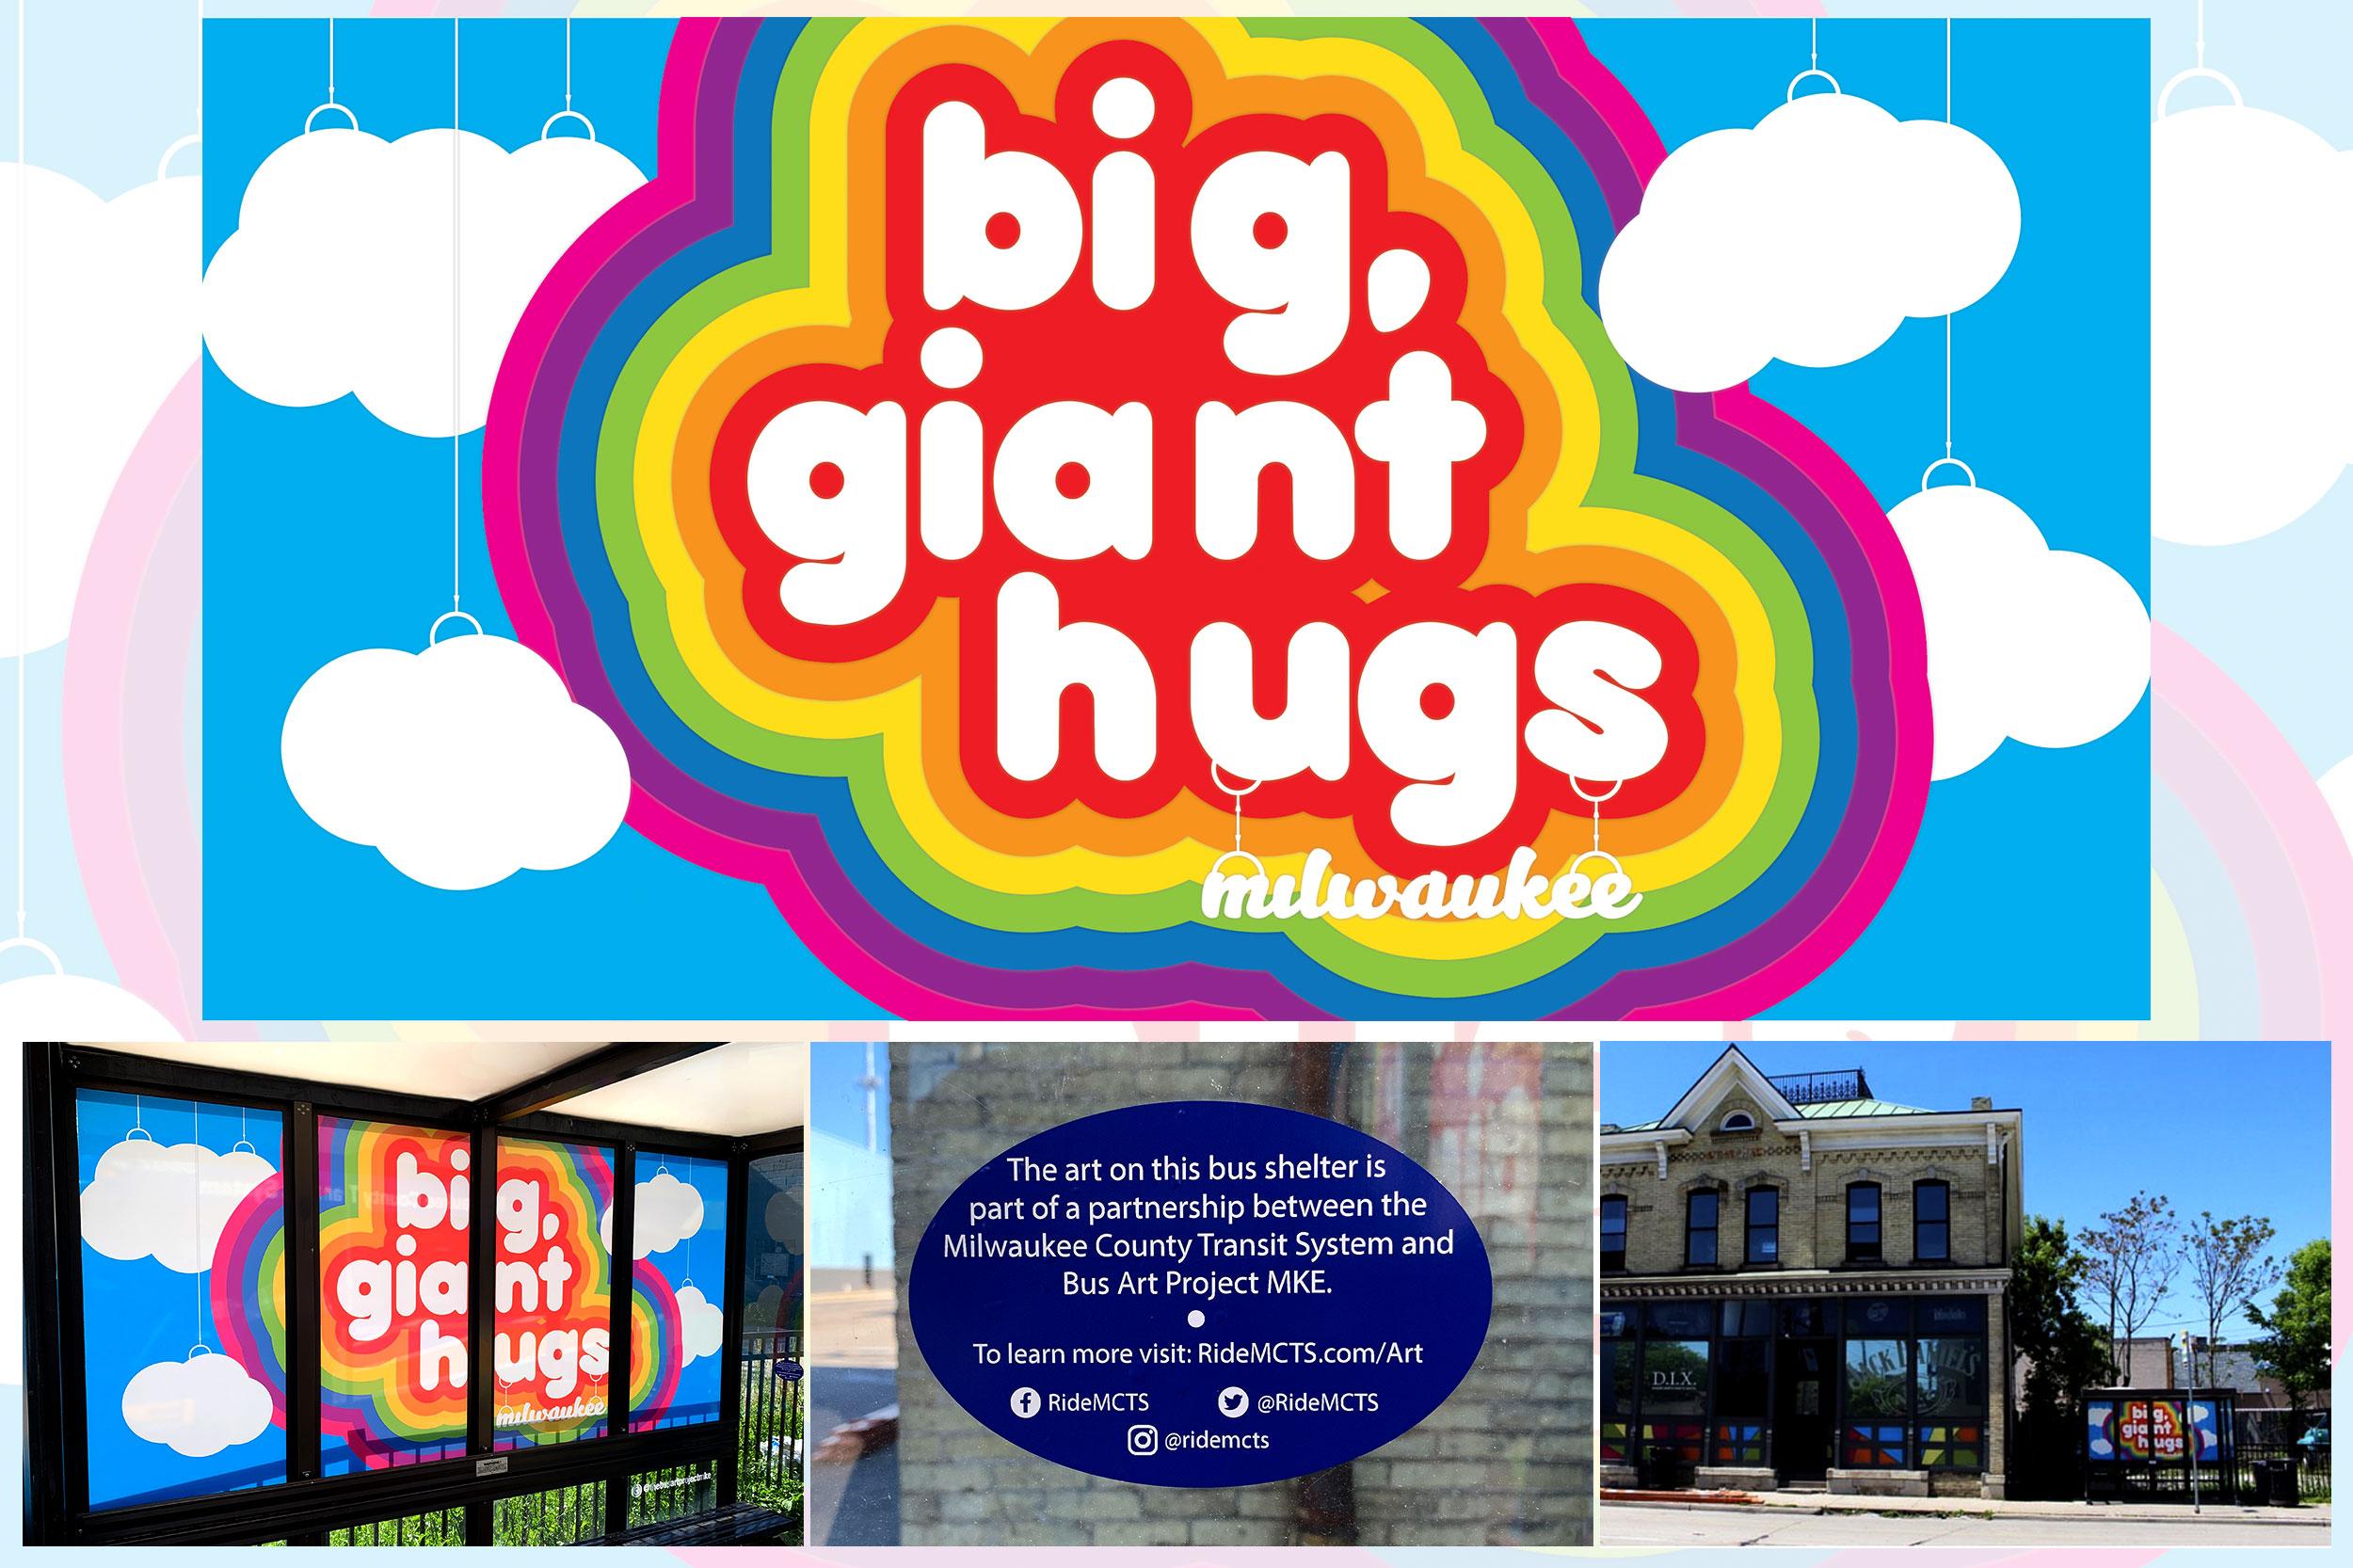 Bus Shelter Art: Big, Giant Hugs (2019)